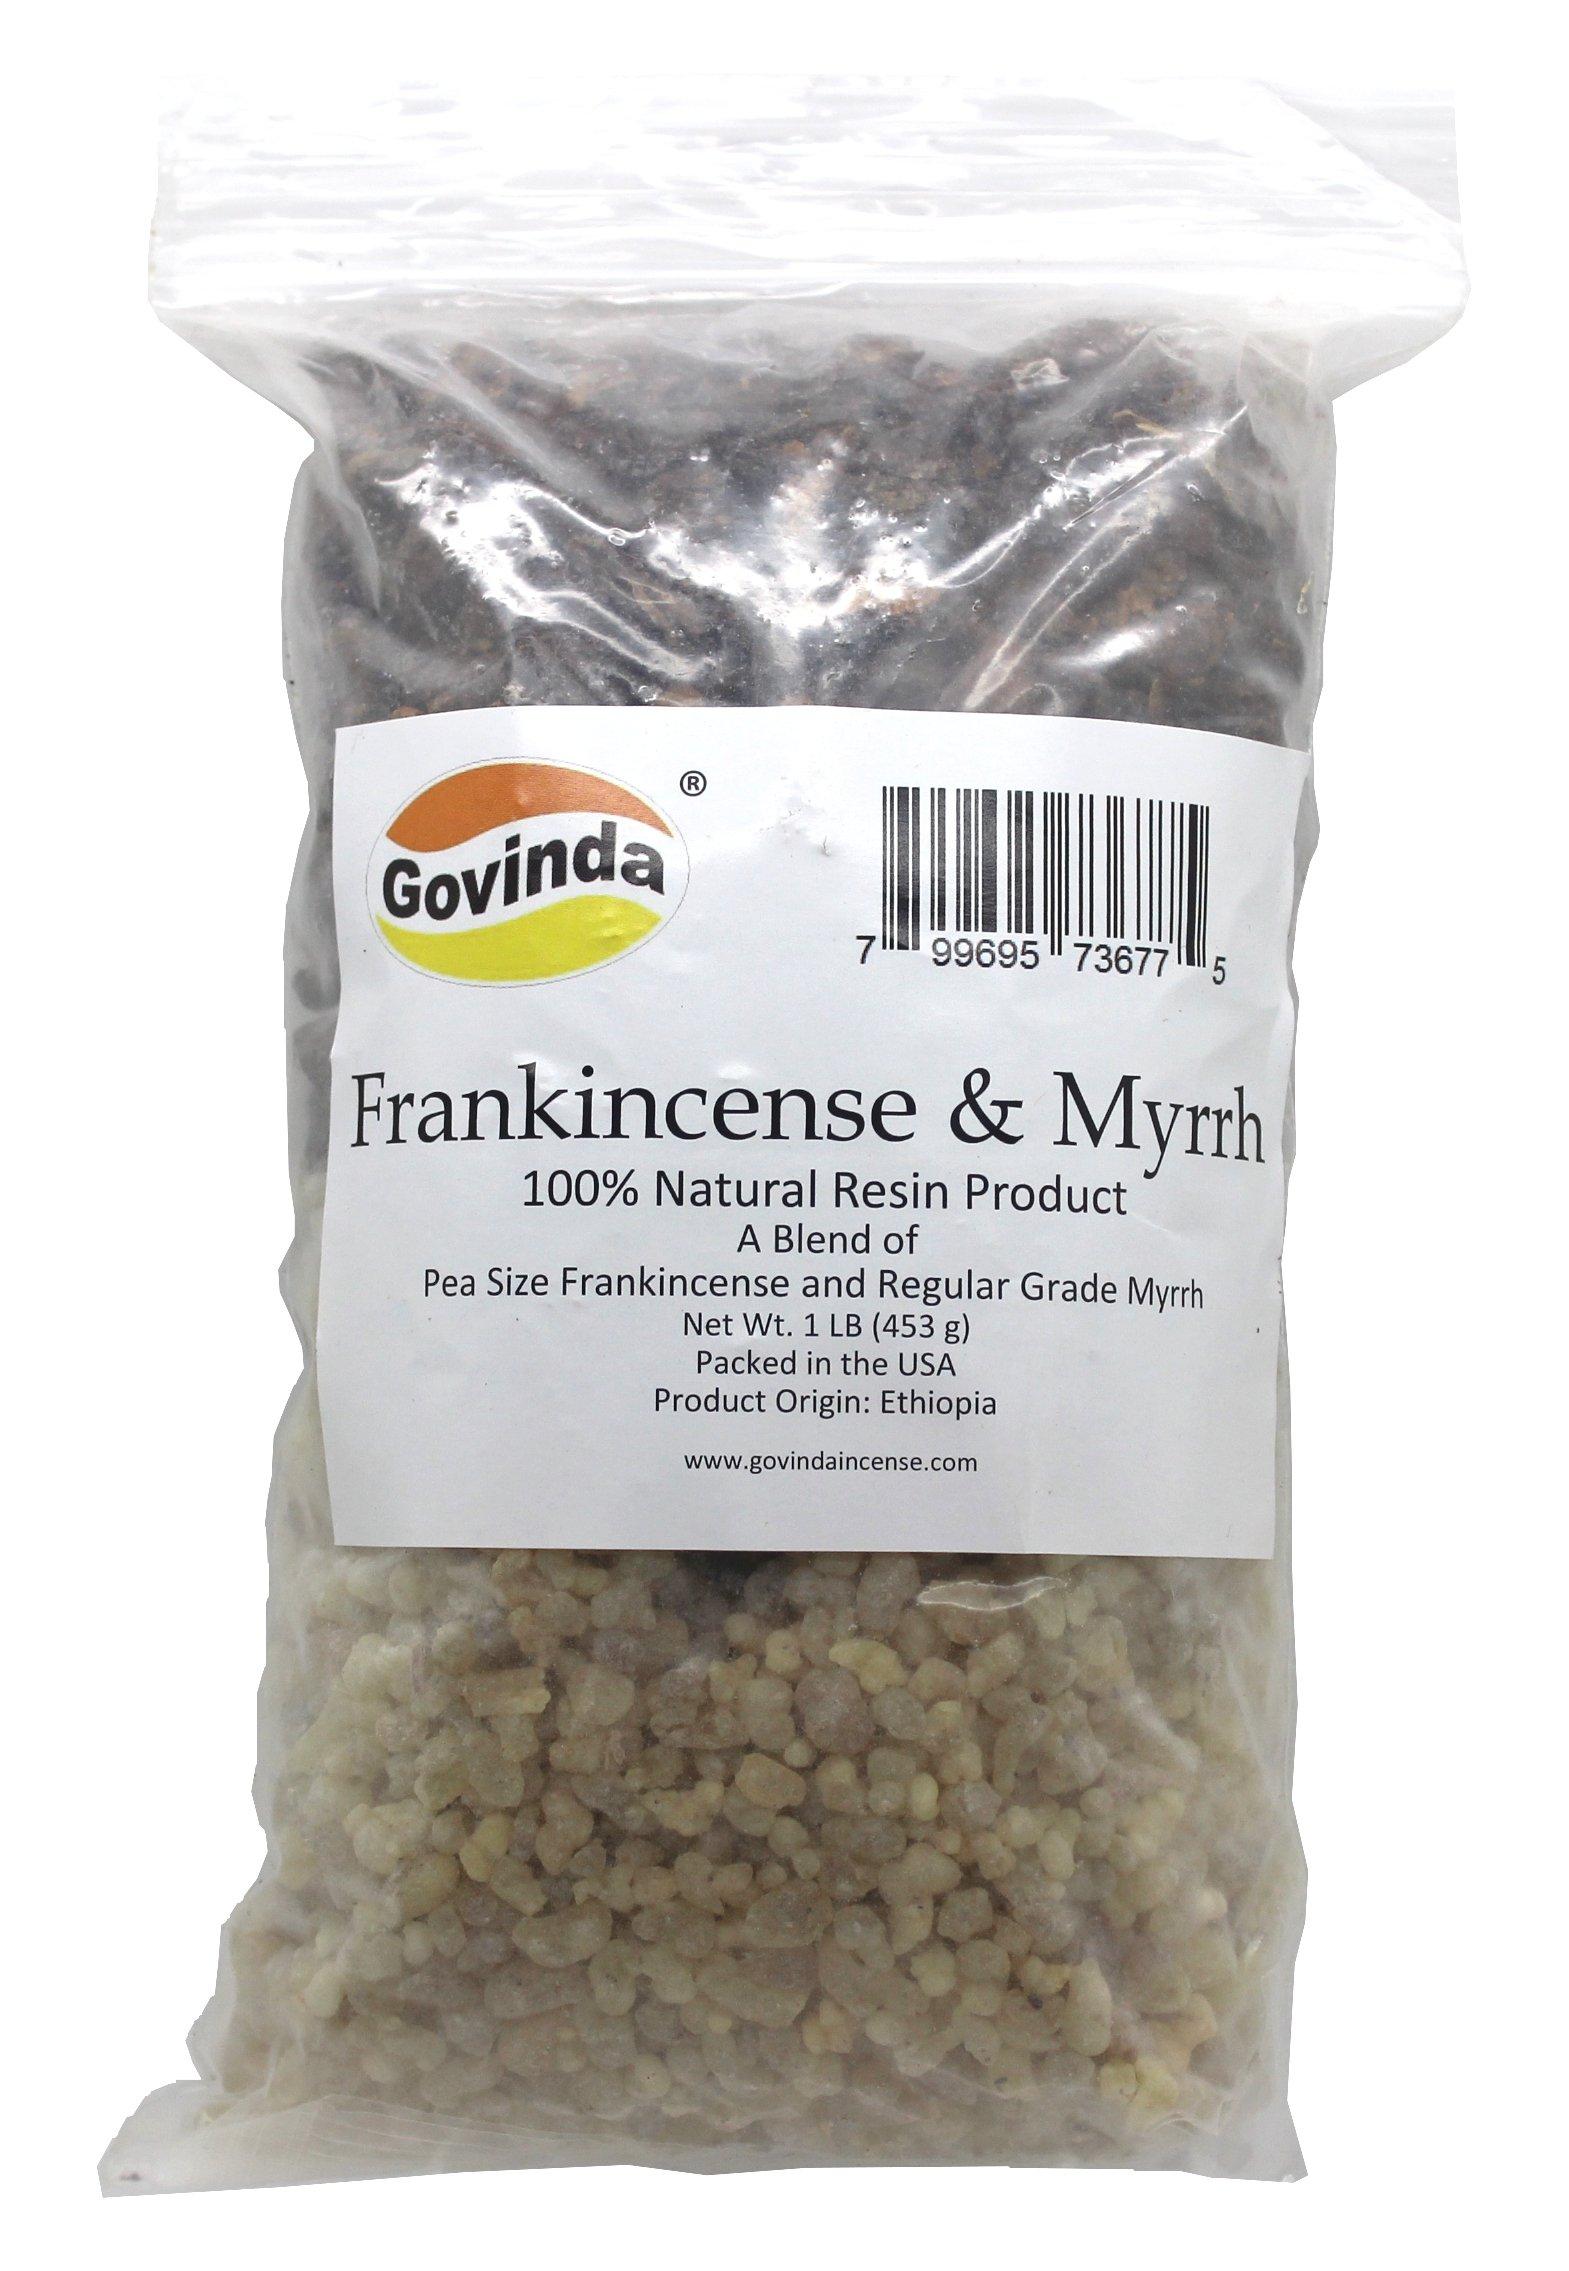 Govinda Natural Frankincense & Myrrh Resin Regular Grade - 1 Pound by Govinda